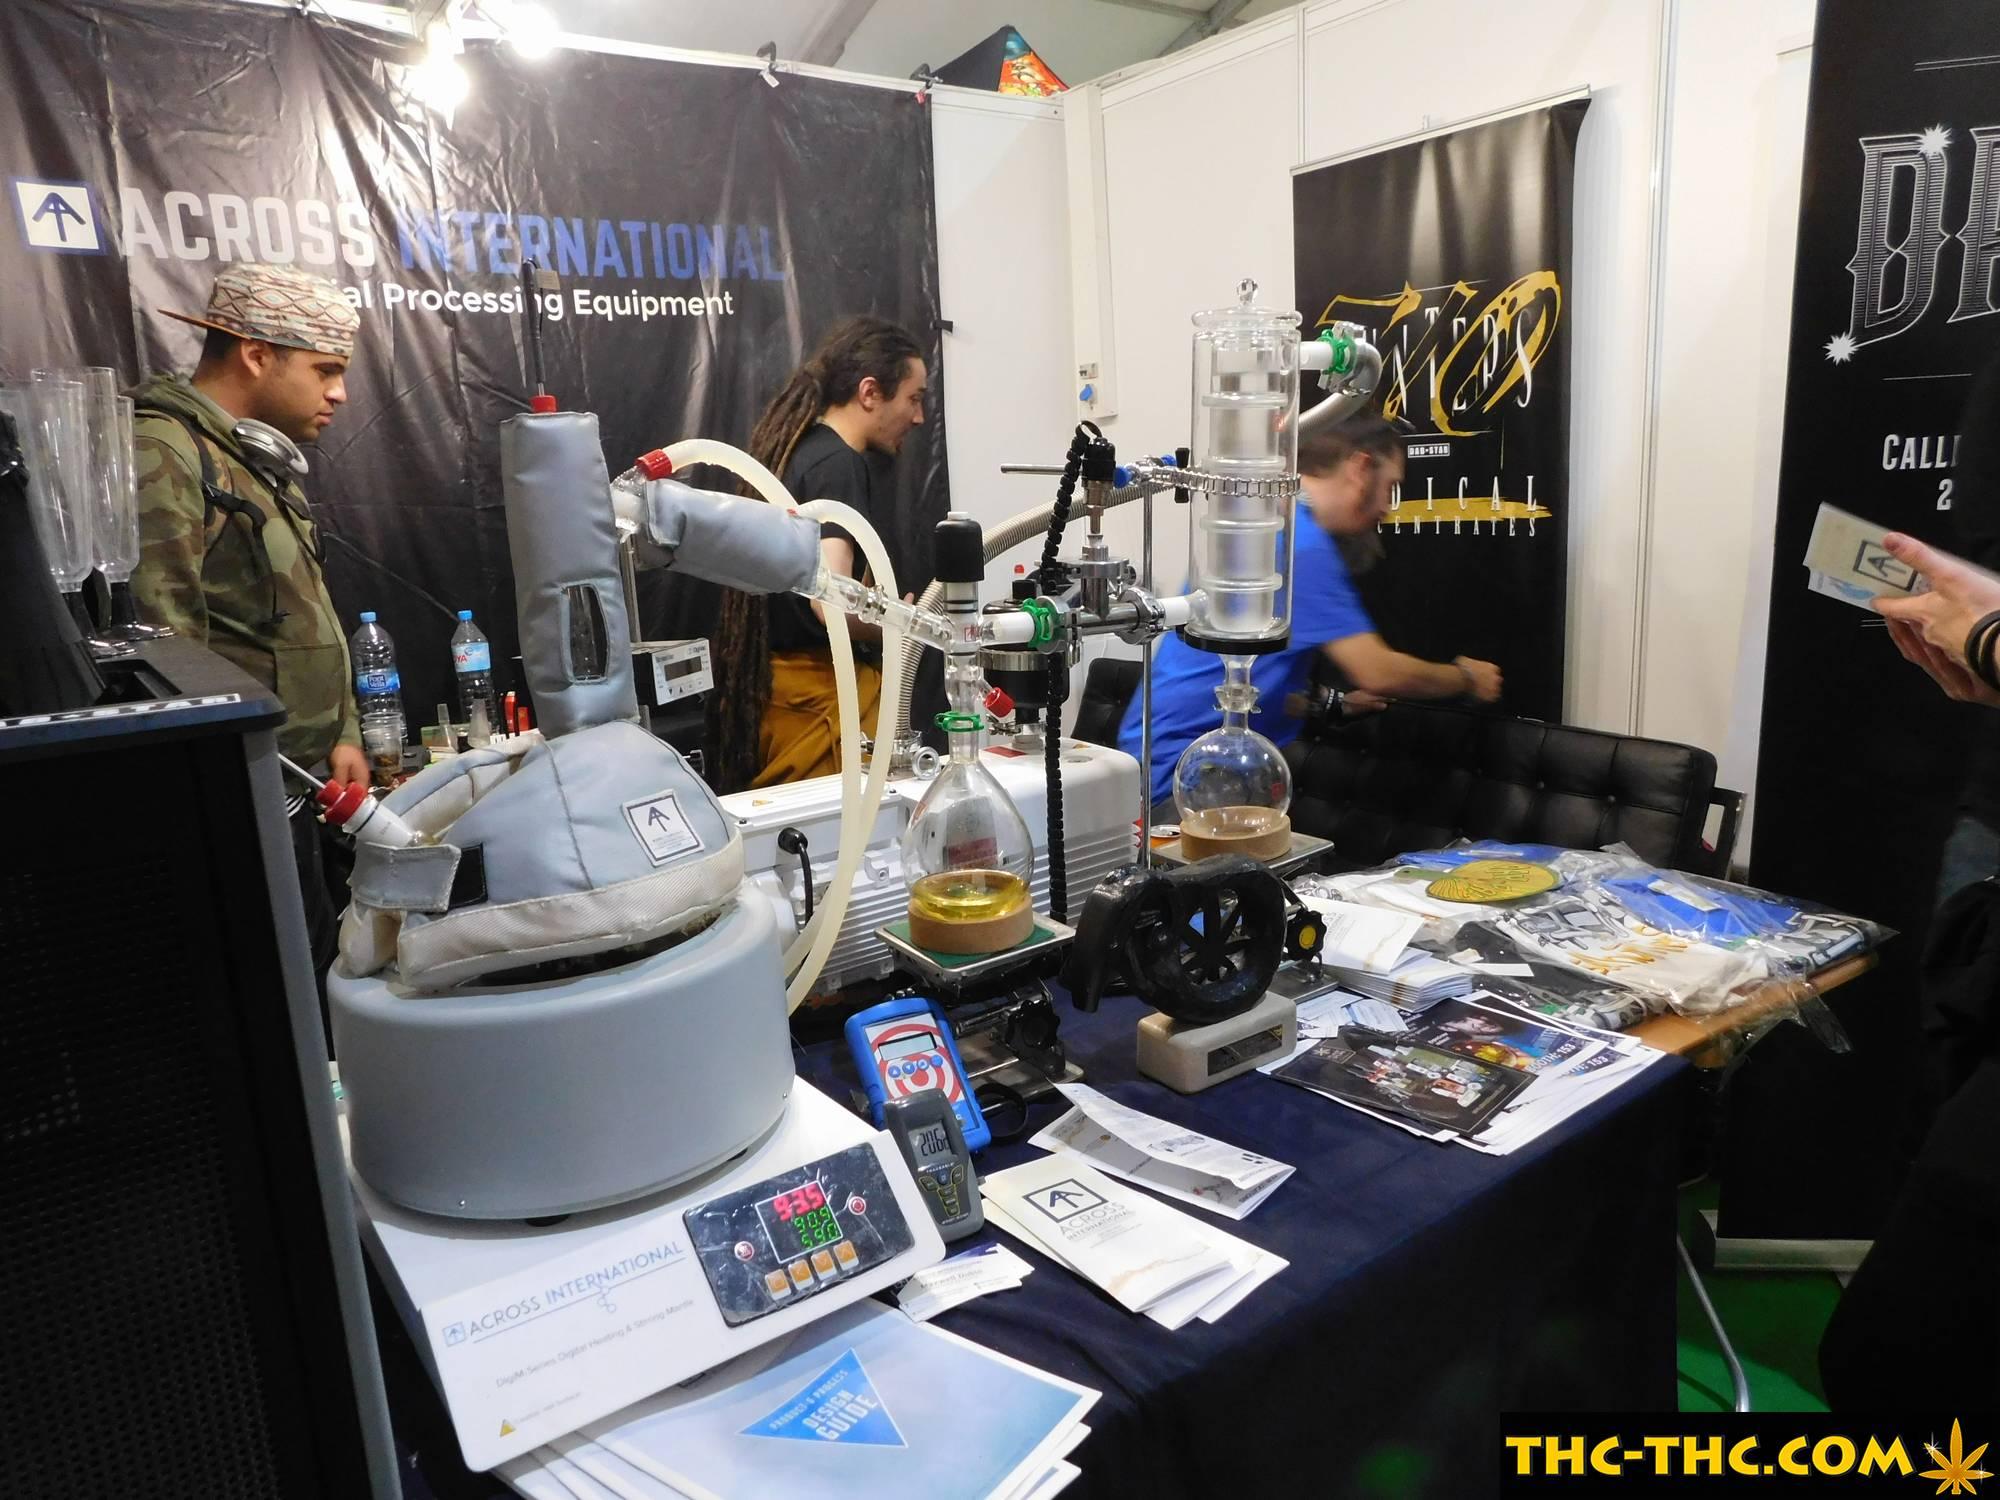 spannabis barcelona 2019